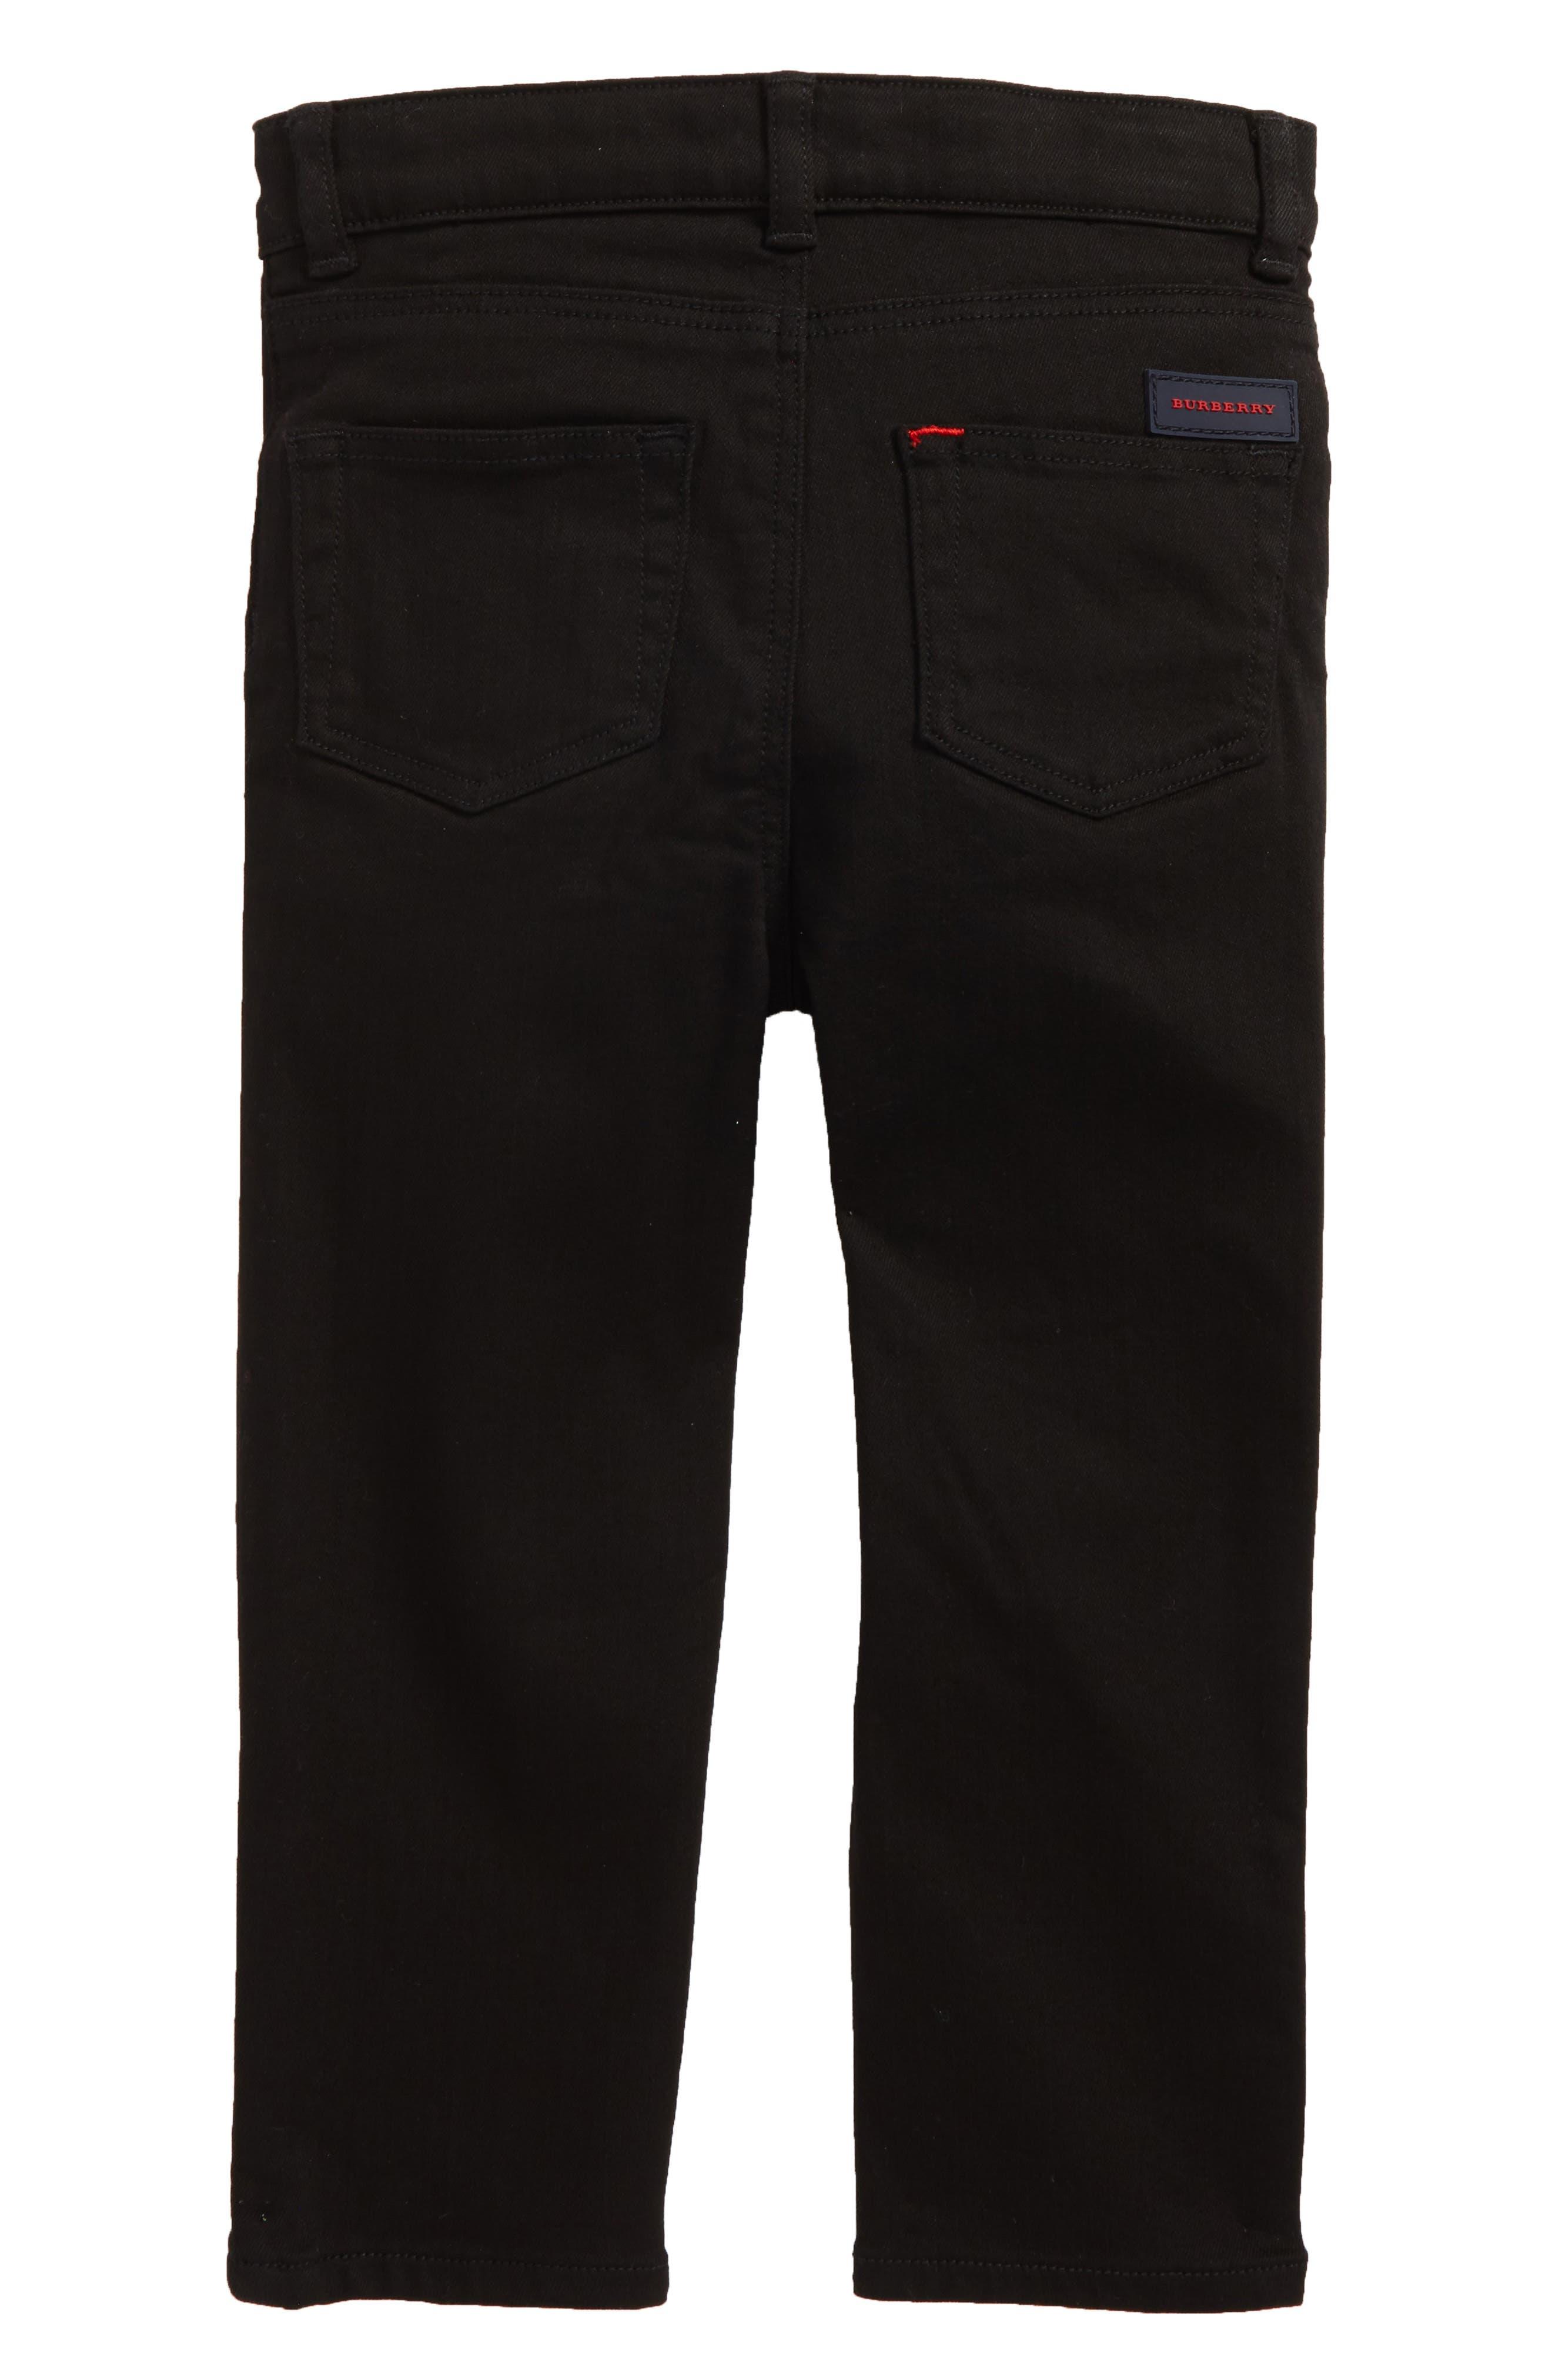 Skinny Jeans,                             Alternate thumbnail 2, color,                             Black